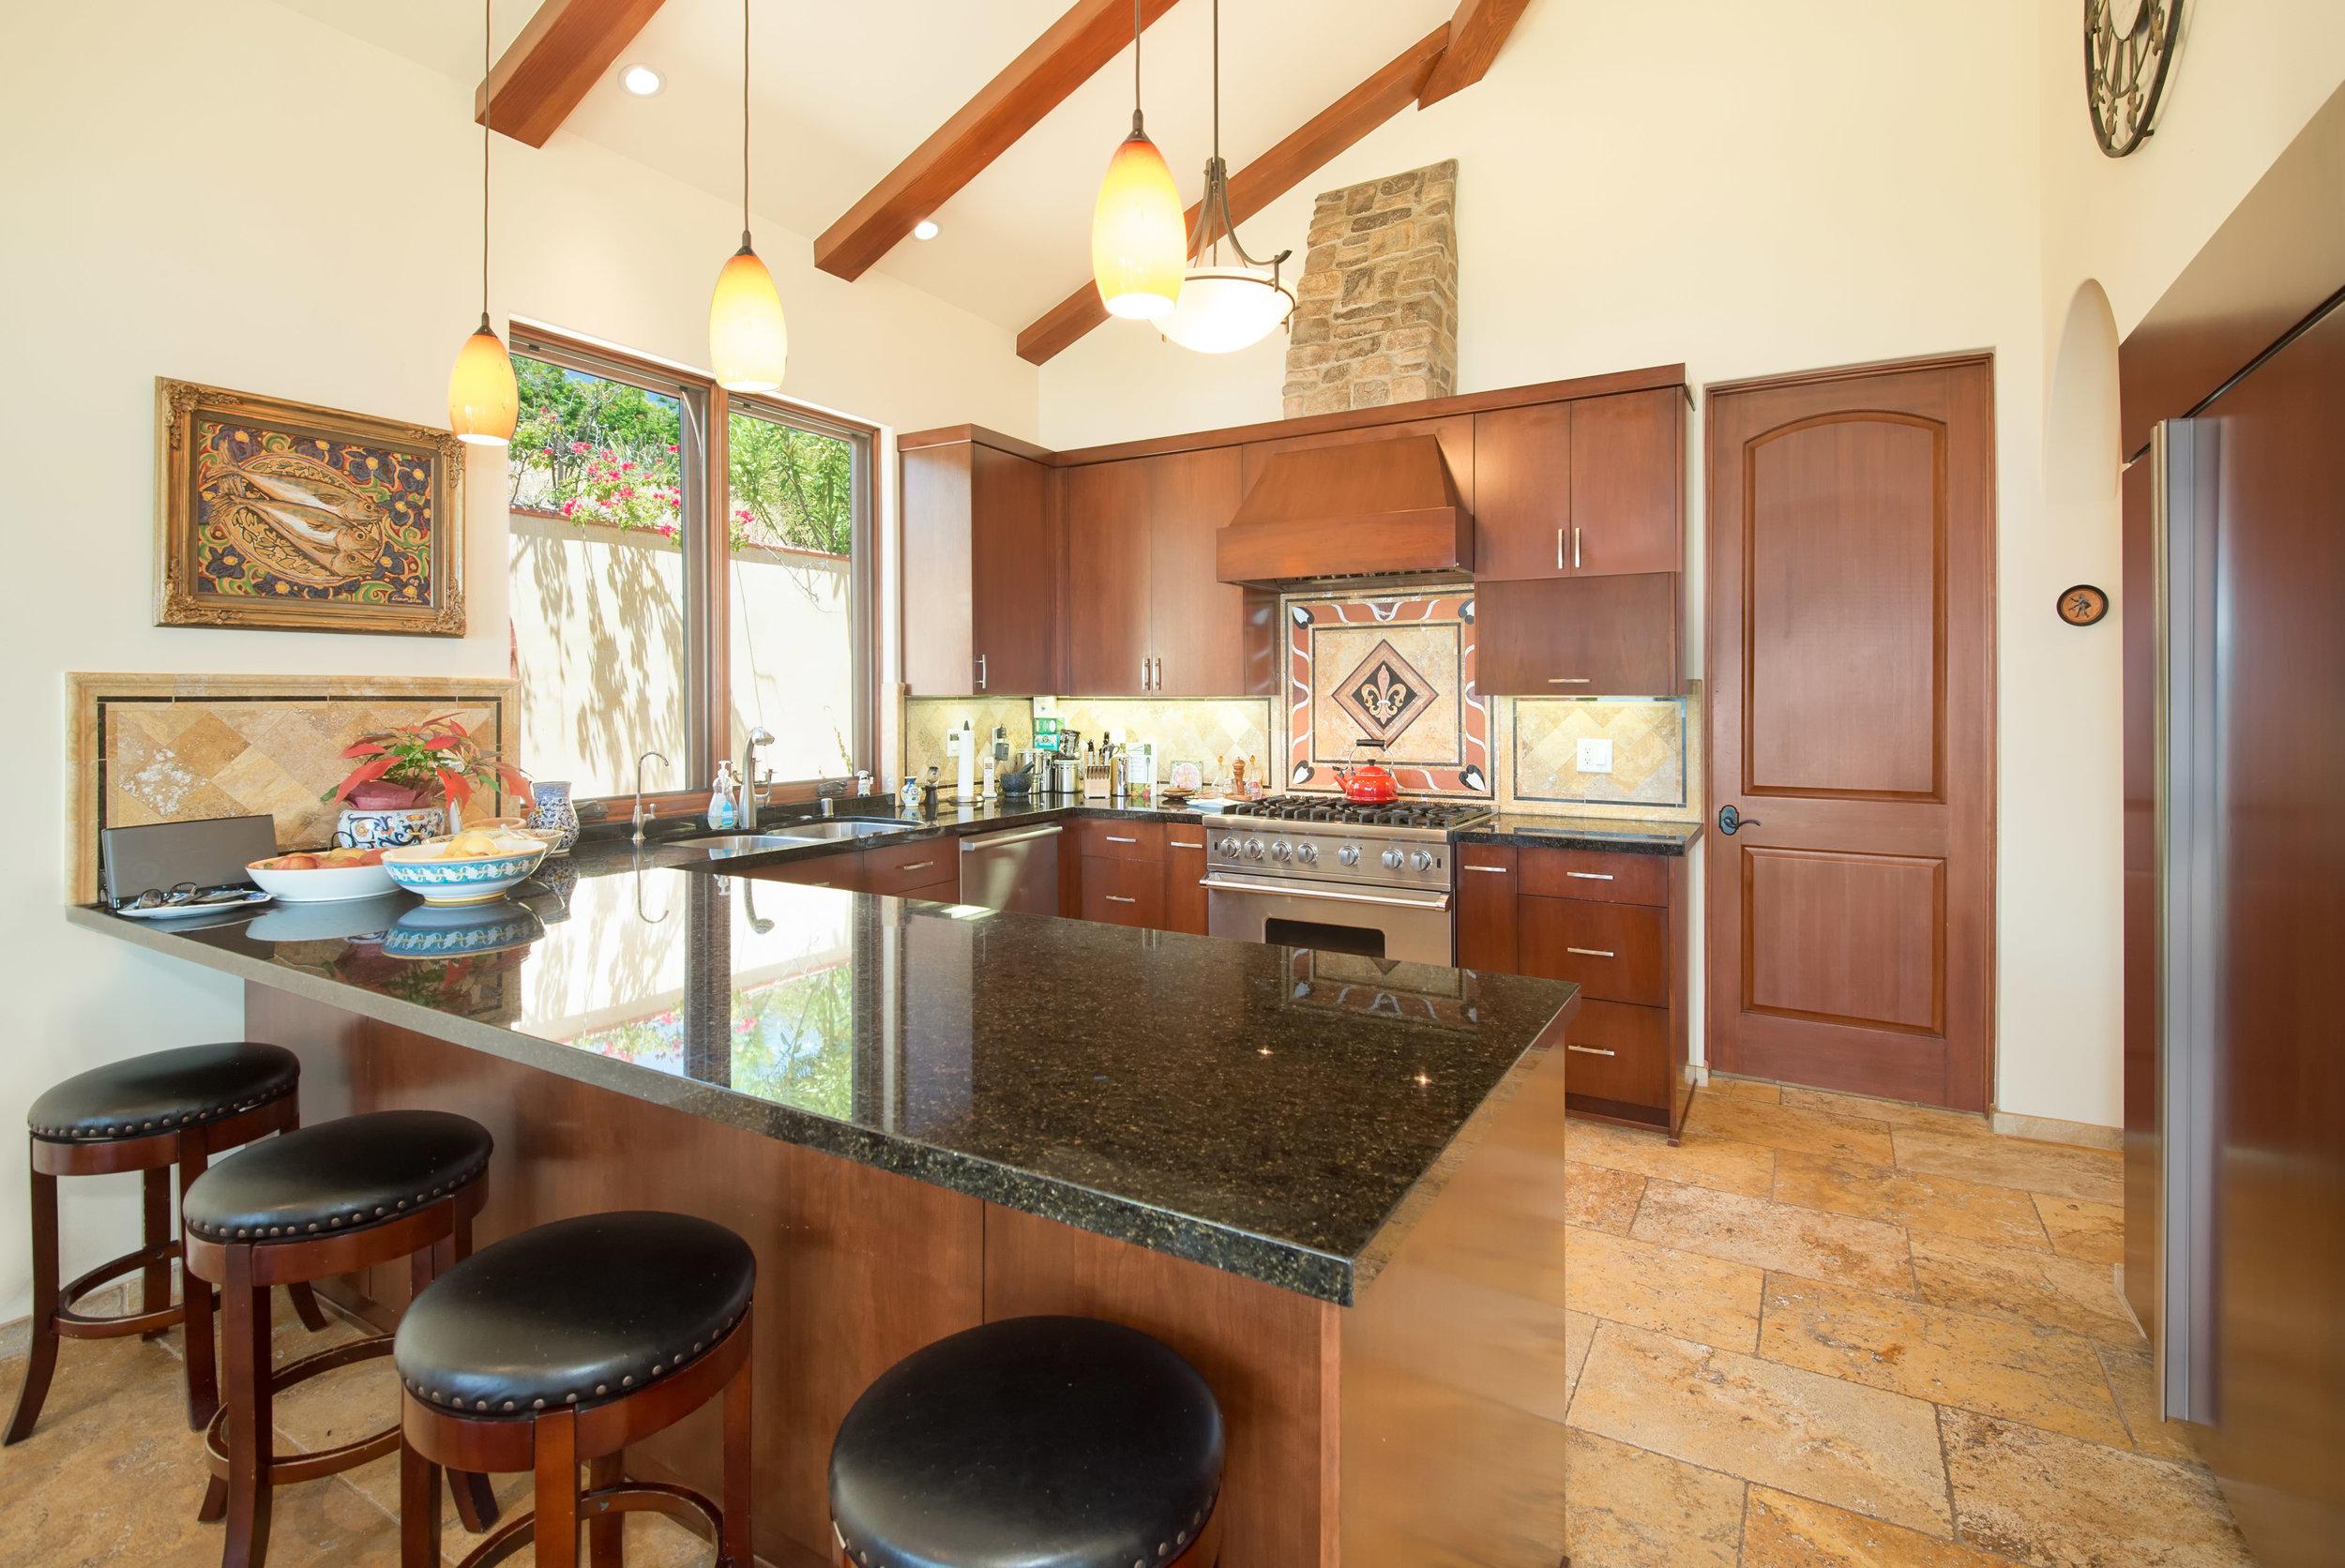 006 Kitchen 26303 Lockwood Road Malibu For Sale Lease The Malibu Life Team Luxury Real Estate.jpg